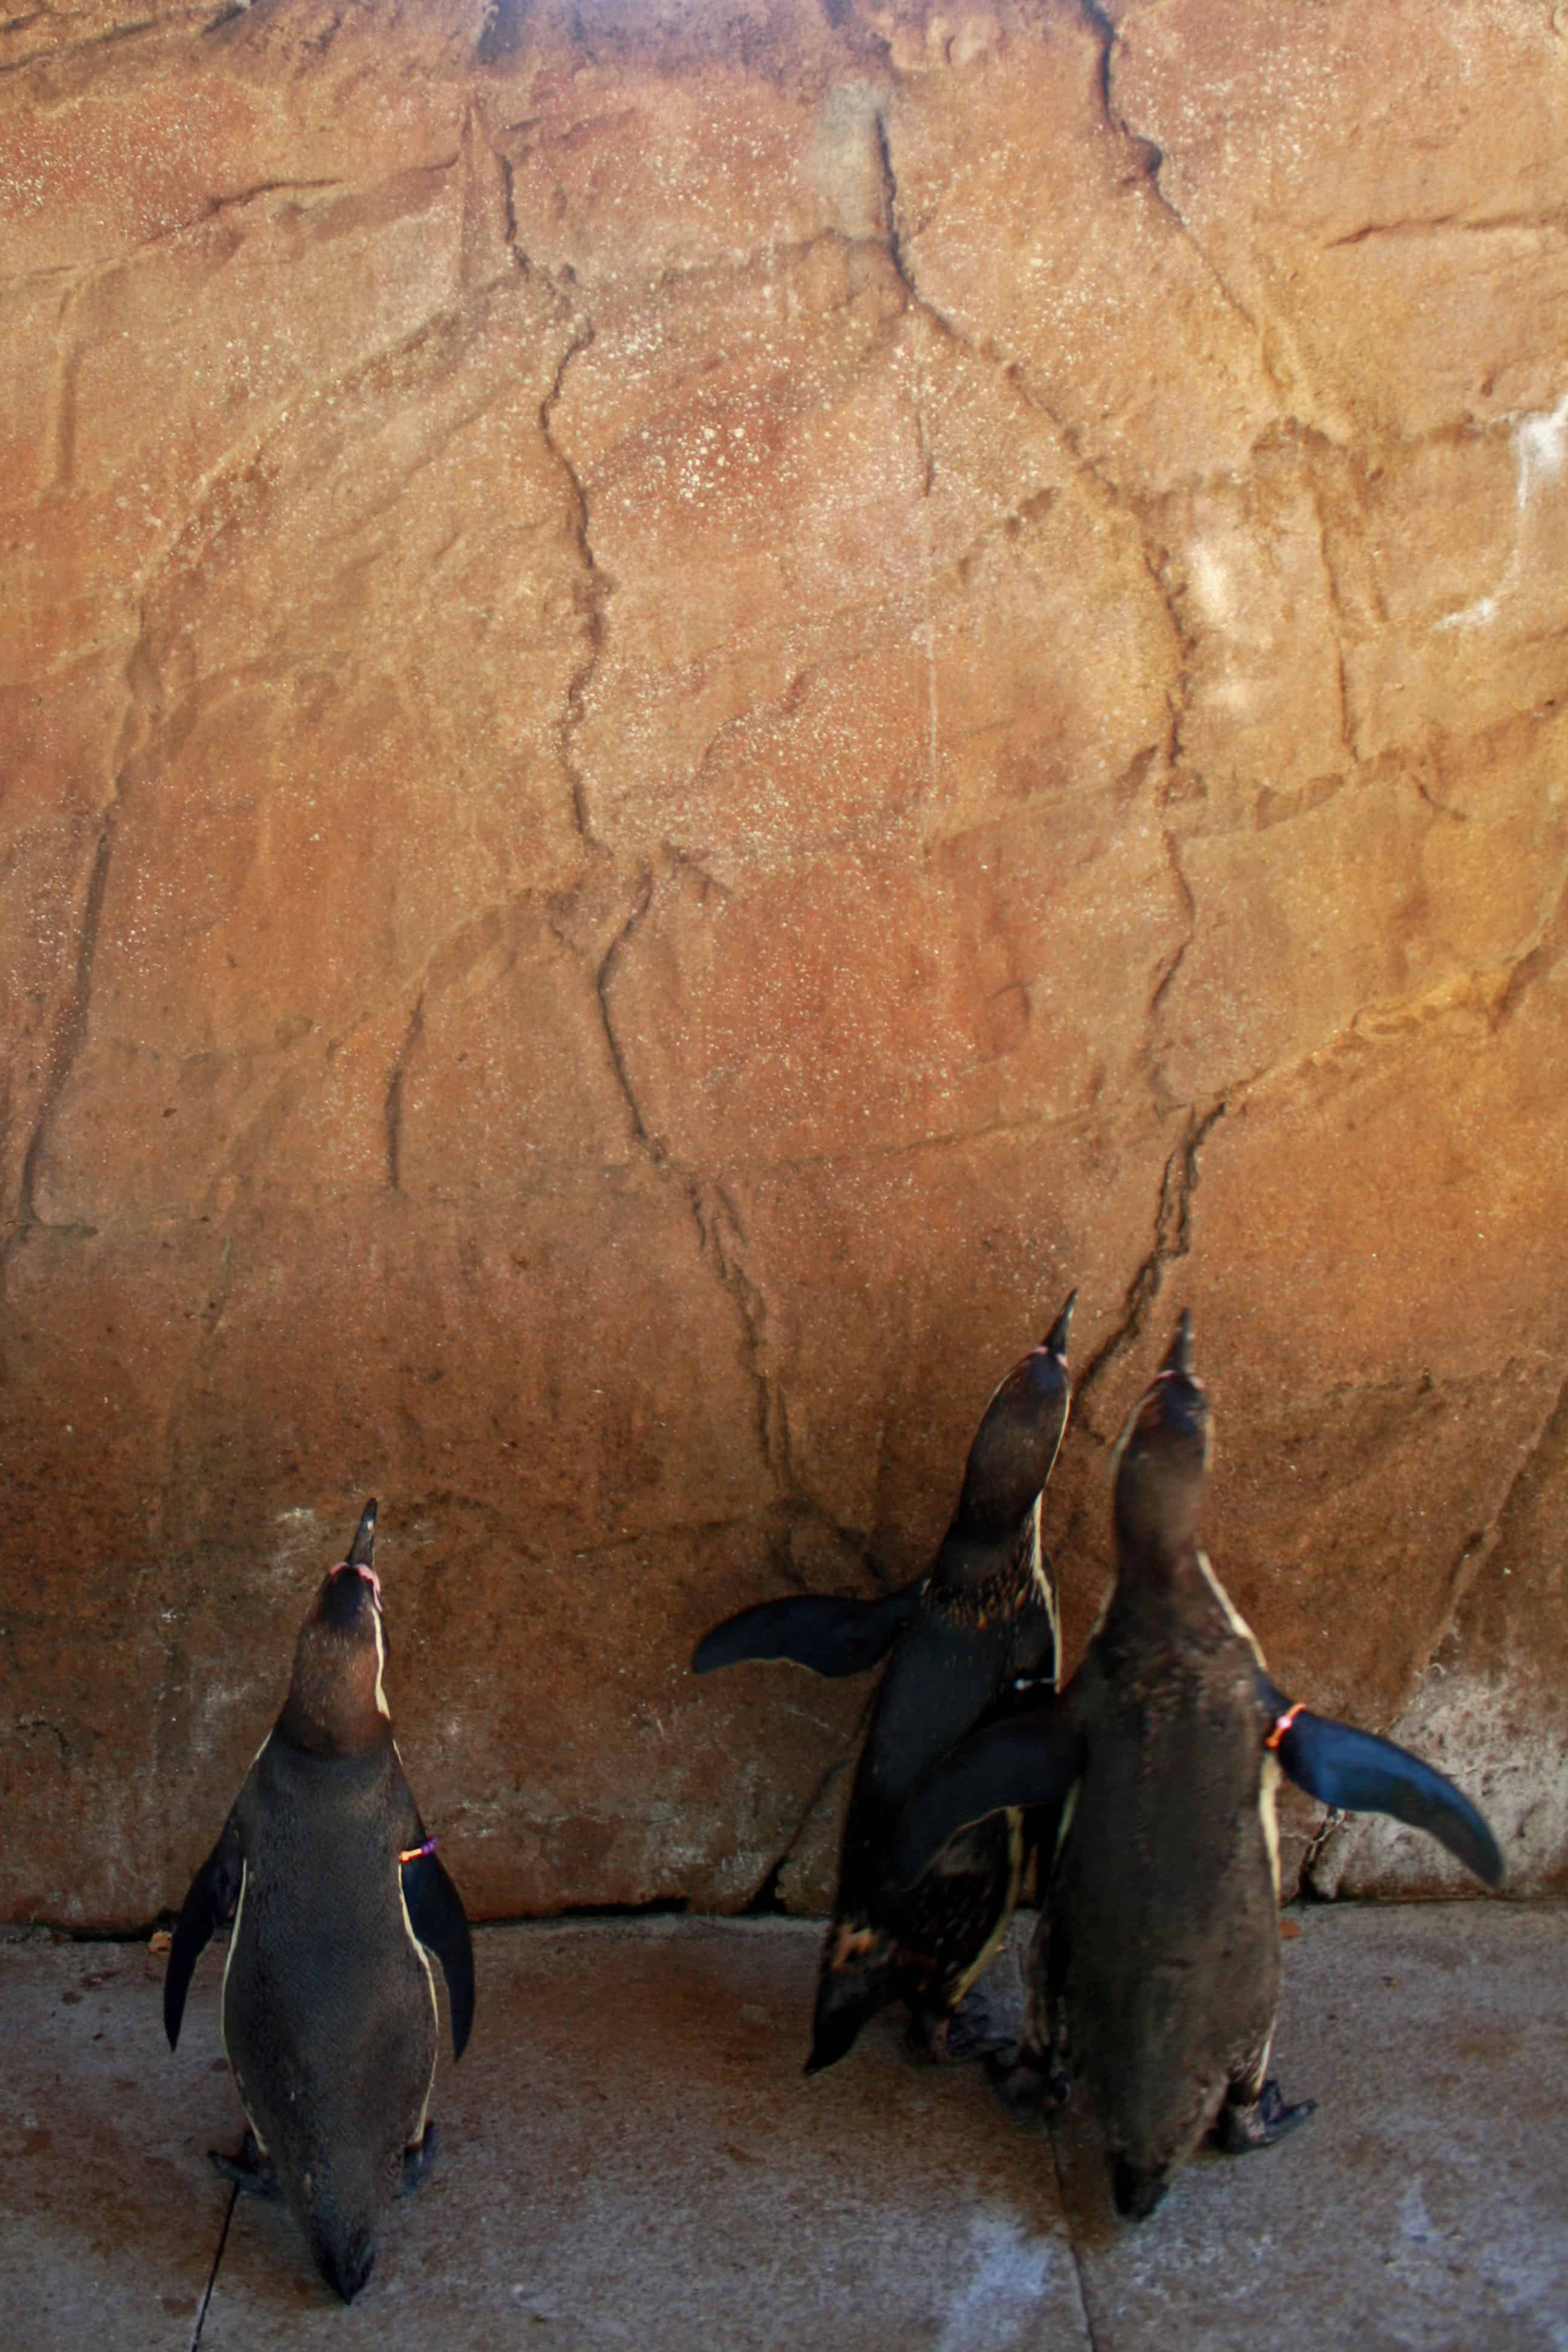 Penguins chasing light at ZSL London Zoo